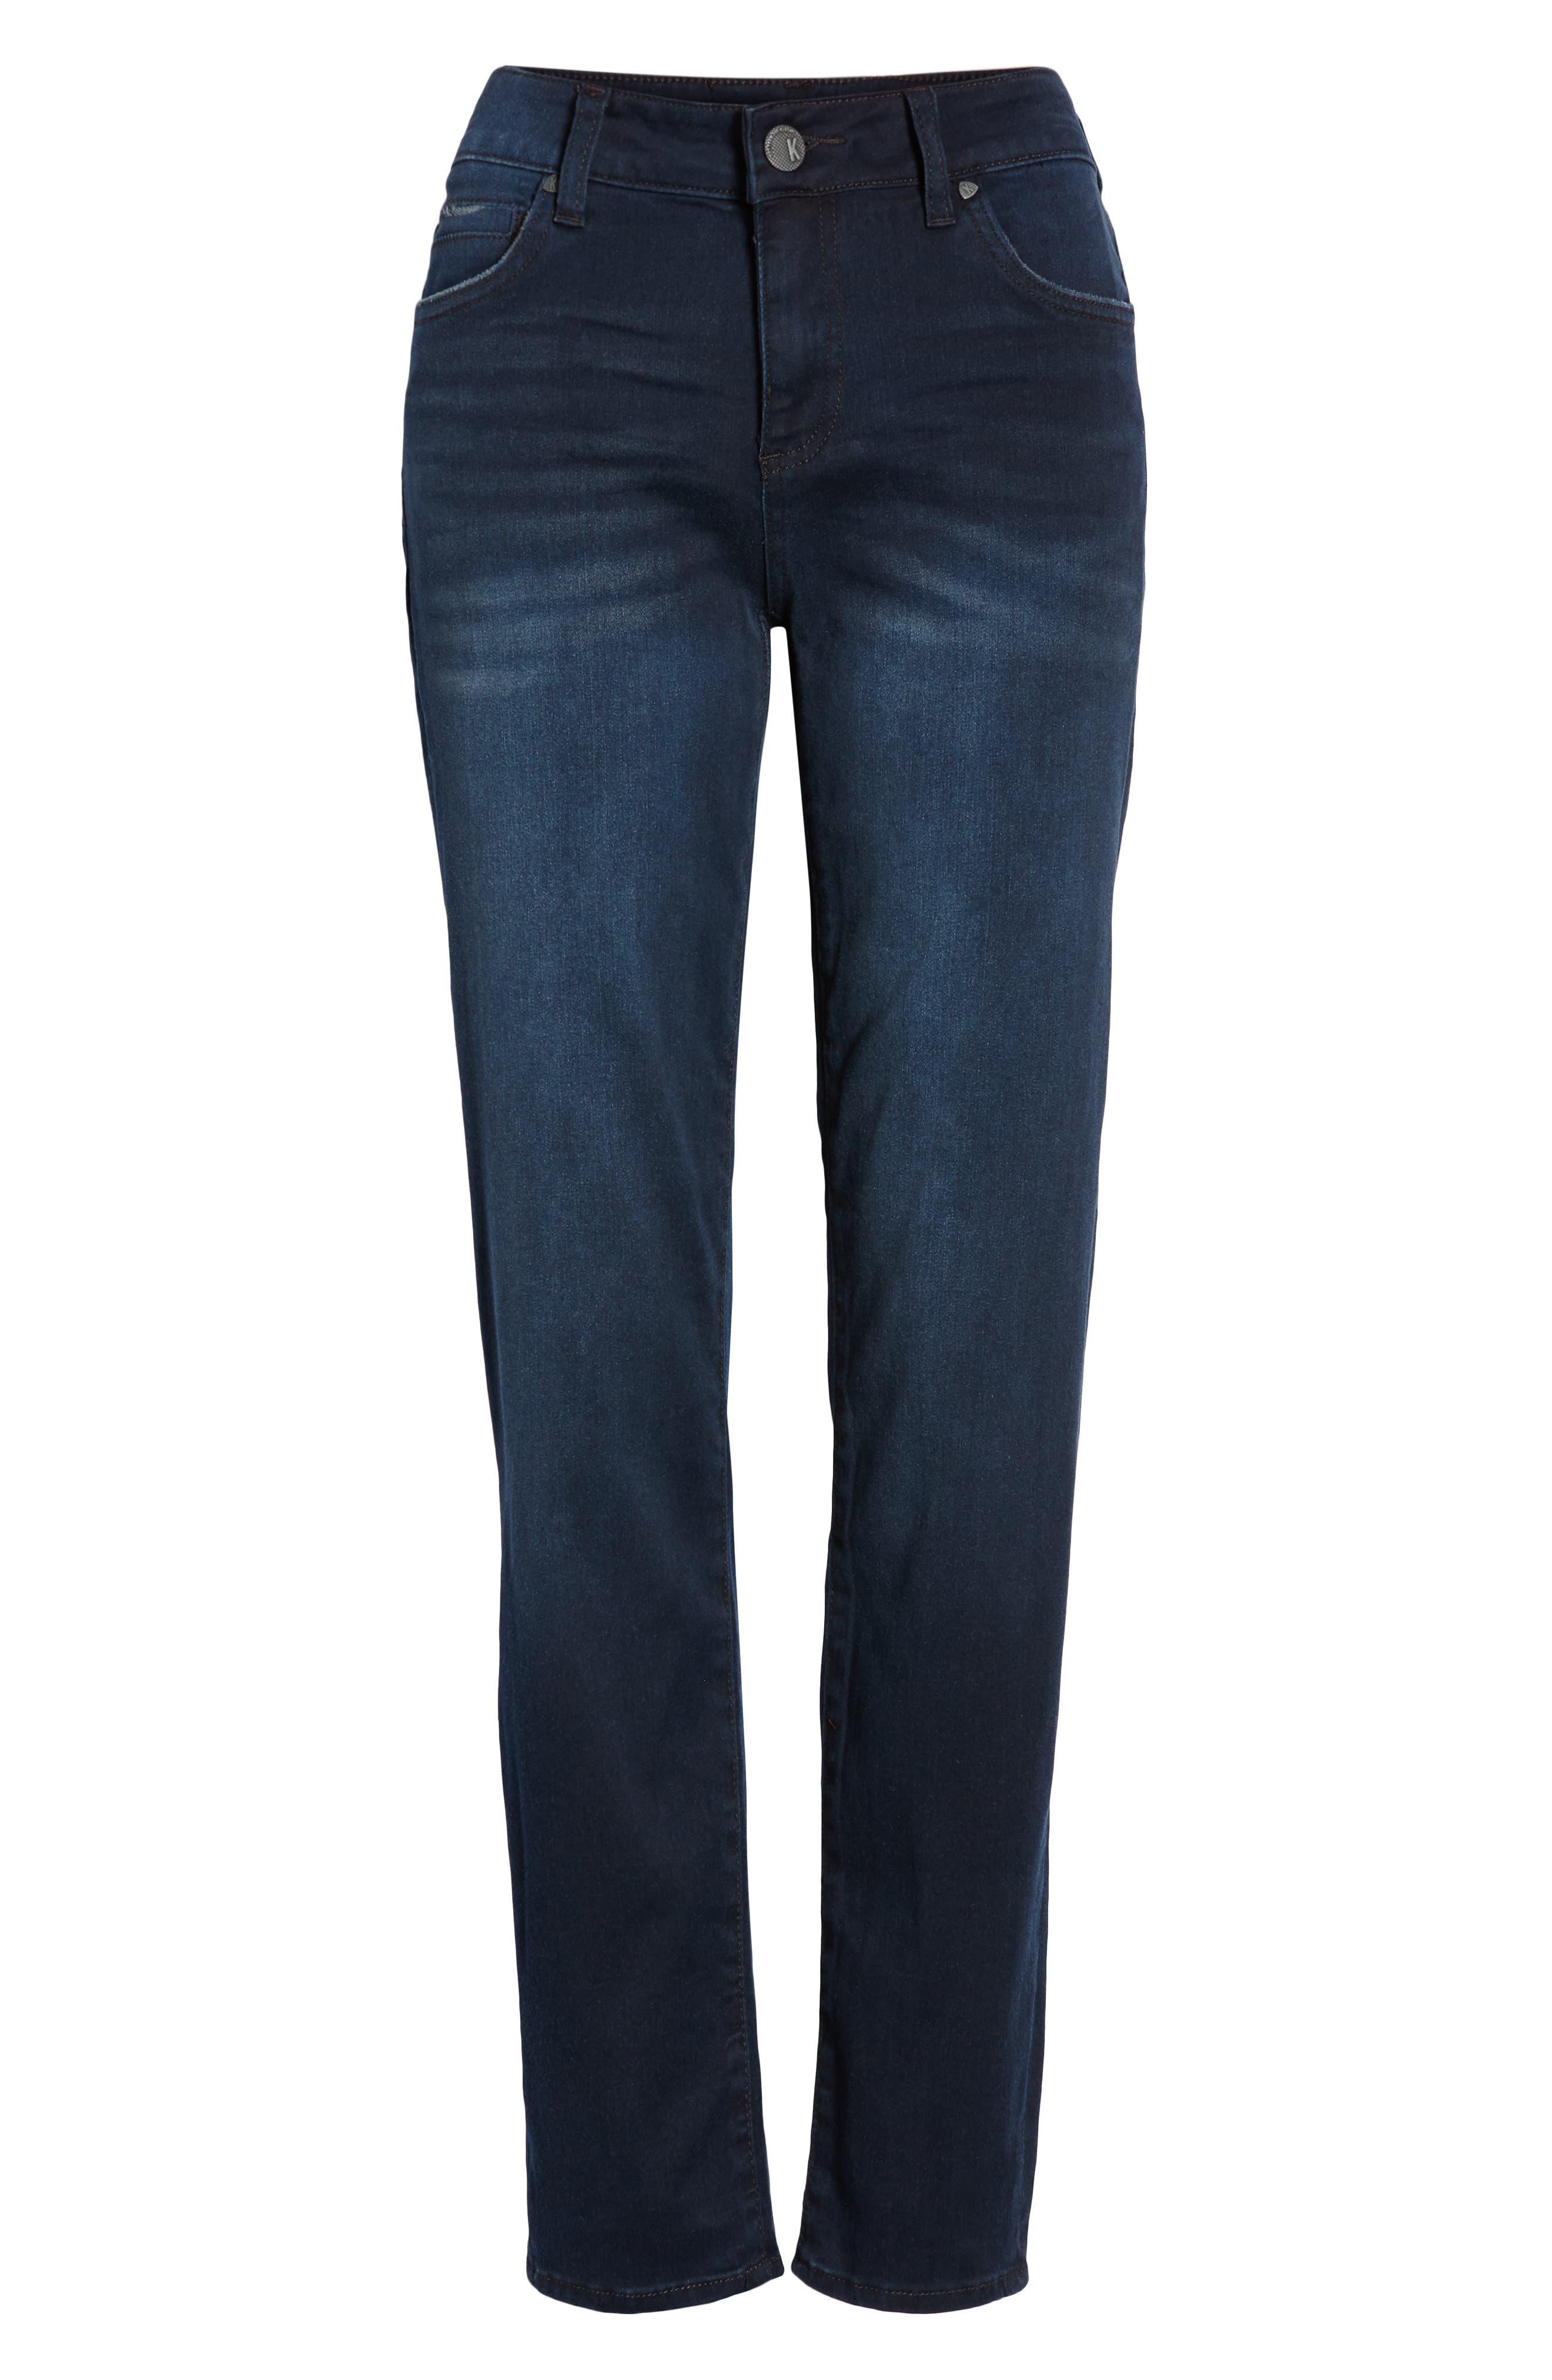 Diana Skinny Jeans,                             Alternate thumbnail 7, color,                             ART W/ EURO BASE WASH